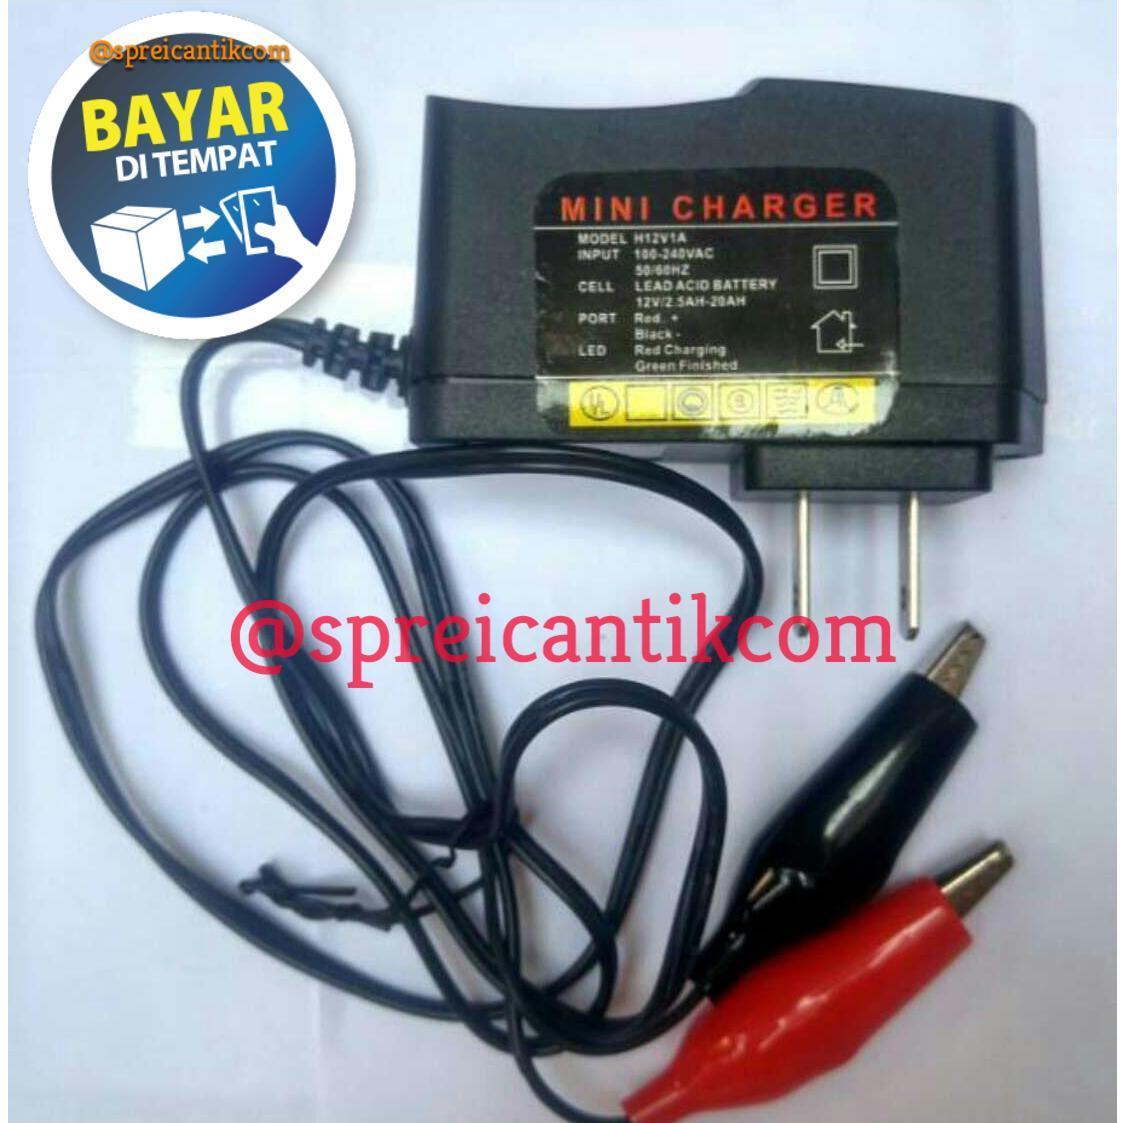 [promo] Adaptor Test Lampu / Mini Charger Aki / Cas Aki Motor 12 V By Sprei Cantik.